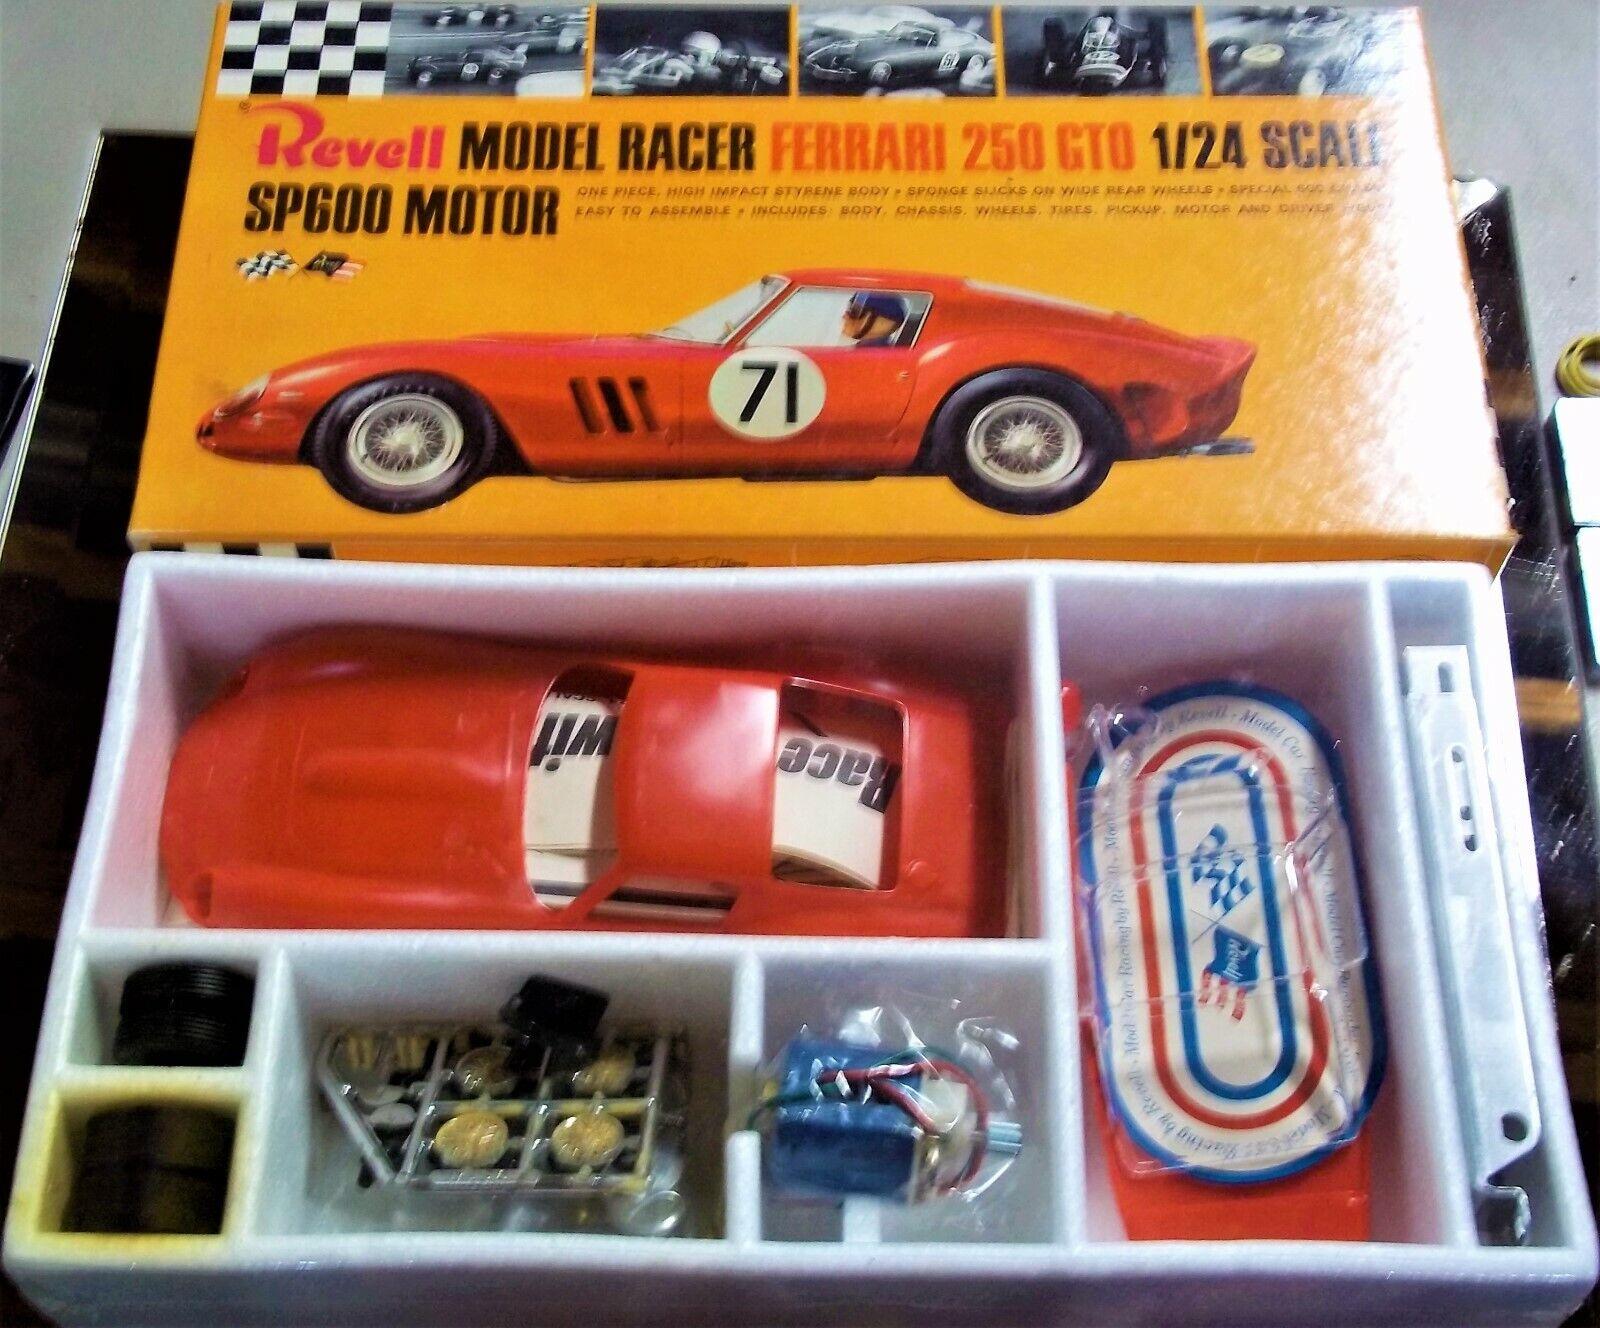 REVELL VINTAGE 1/24 1/25 MINT FERRARI 250 GTO SLOT CAR CHASS